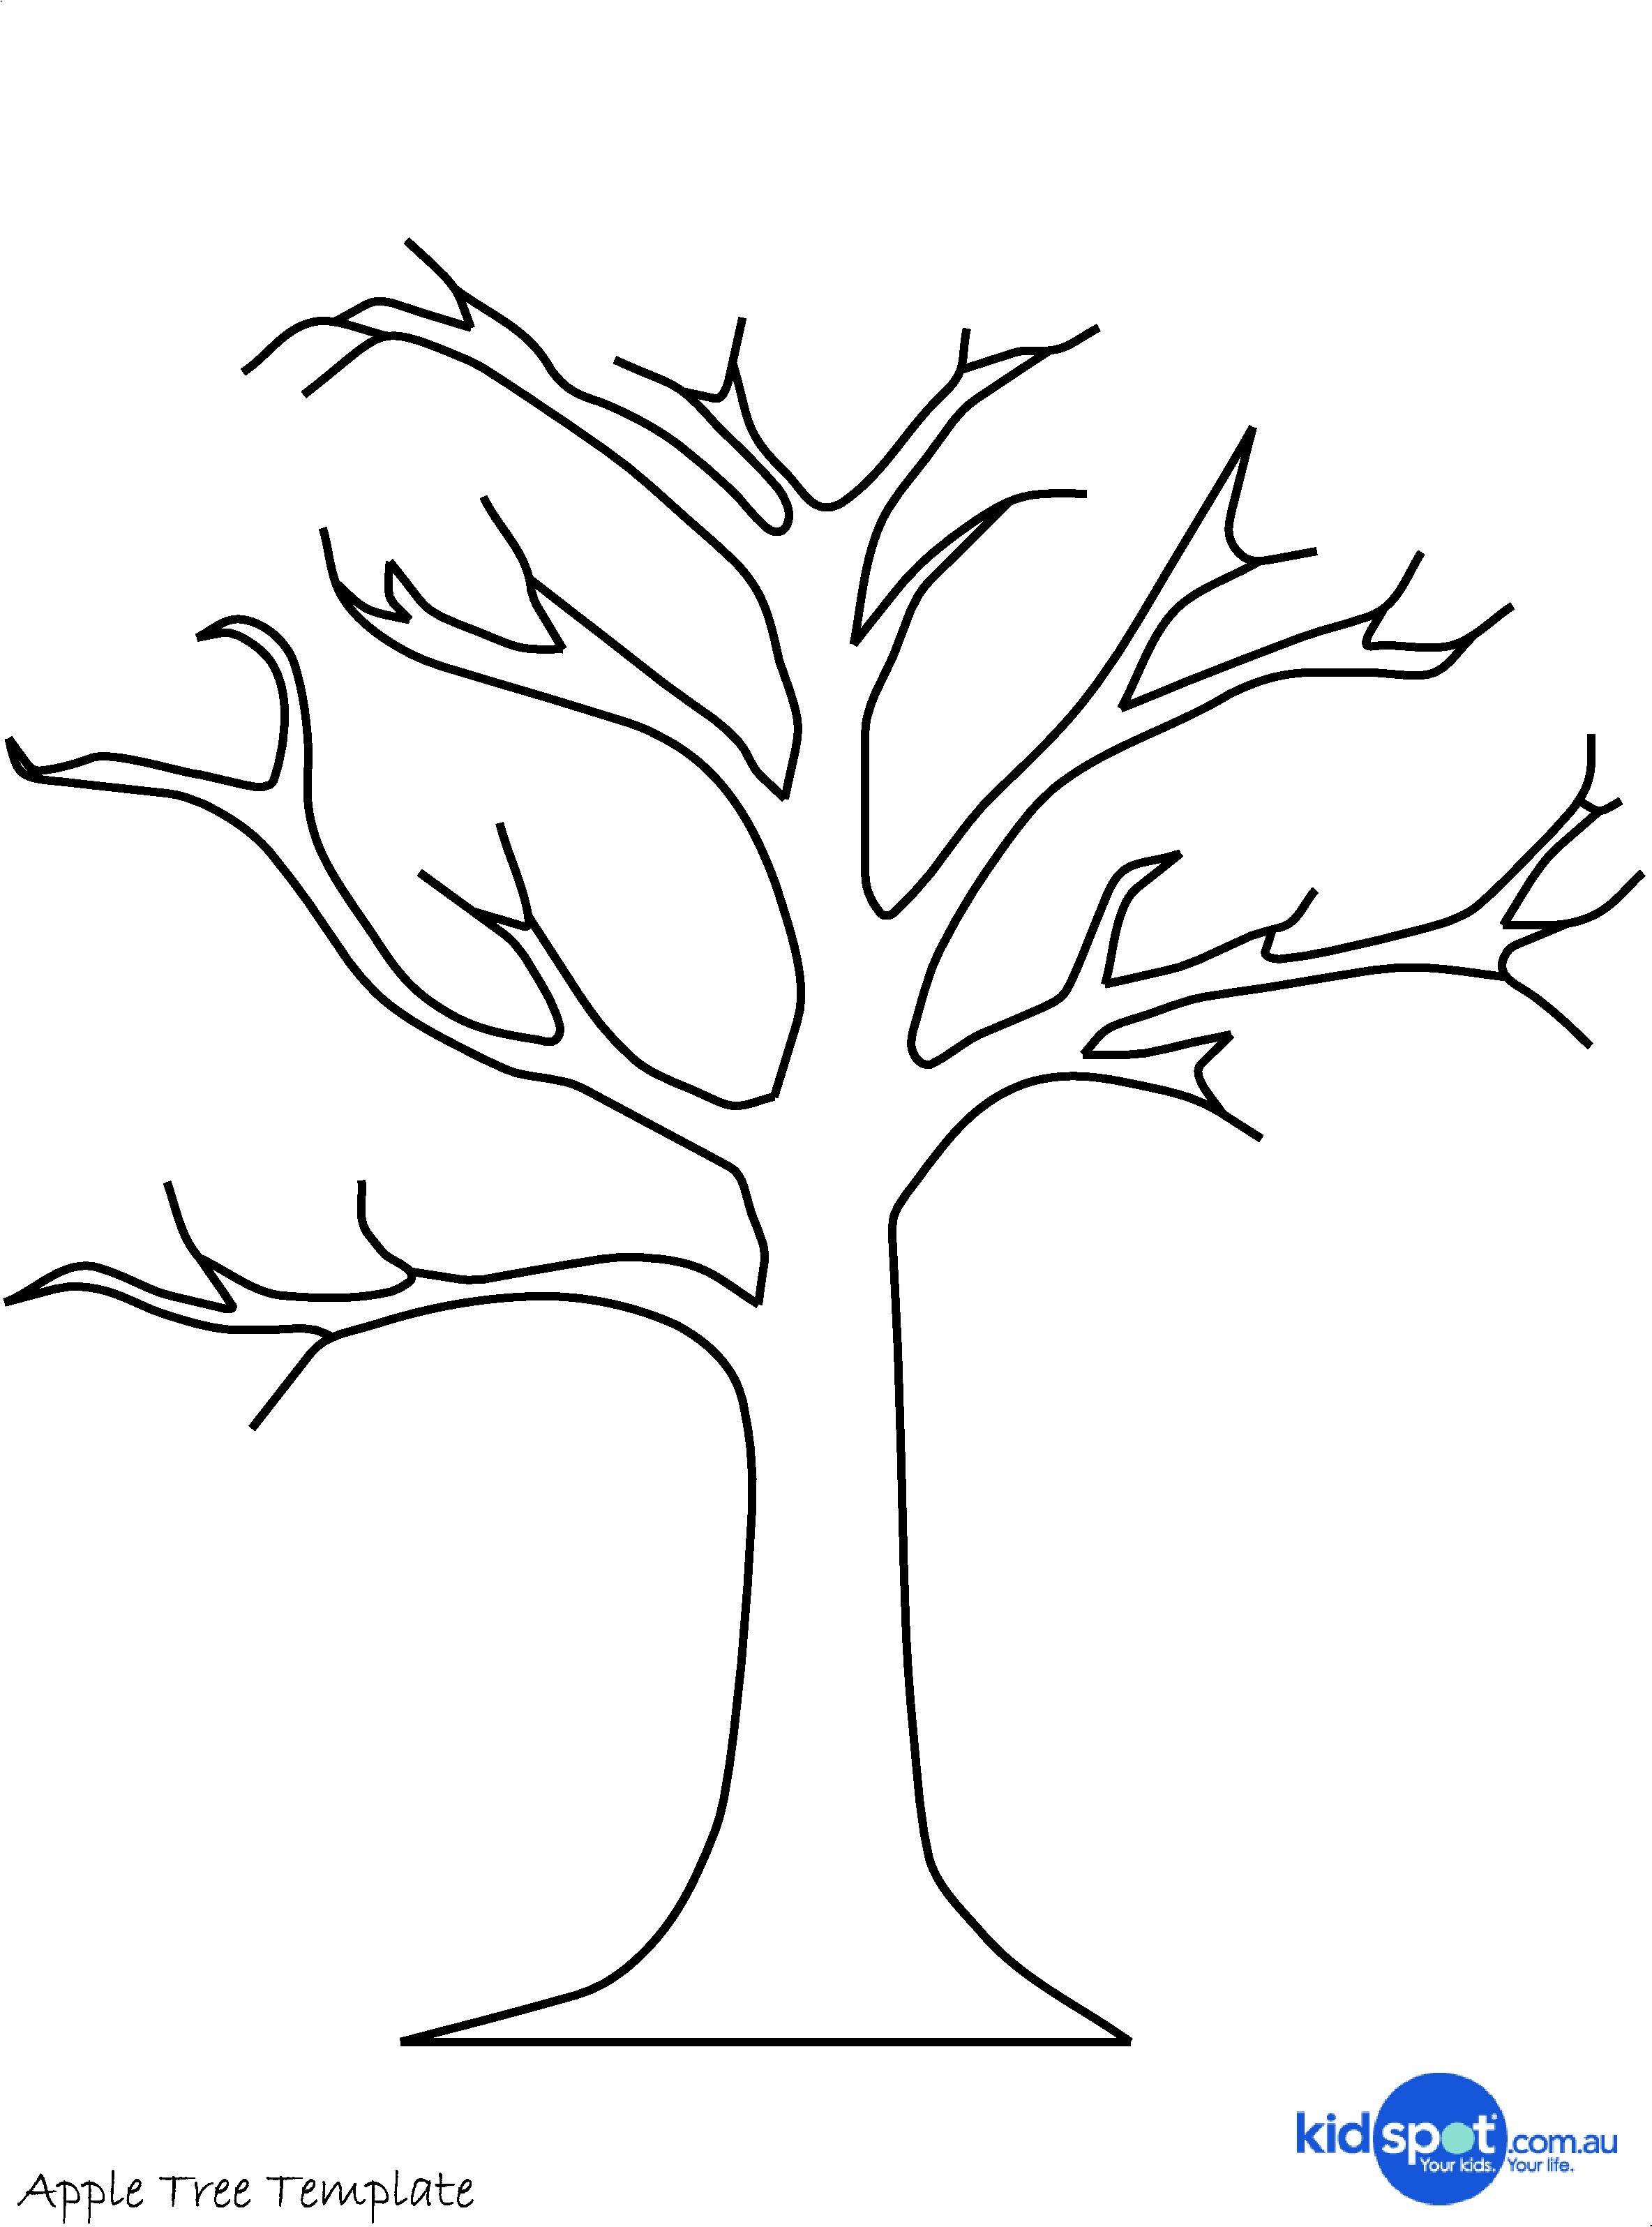 Printable Tree Template | Tree Craft - Cork Stamp Apple Tree - Art - Free Printable Palm Tree Template